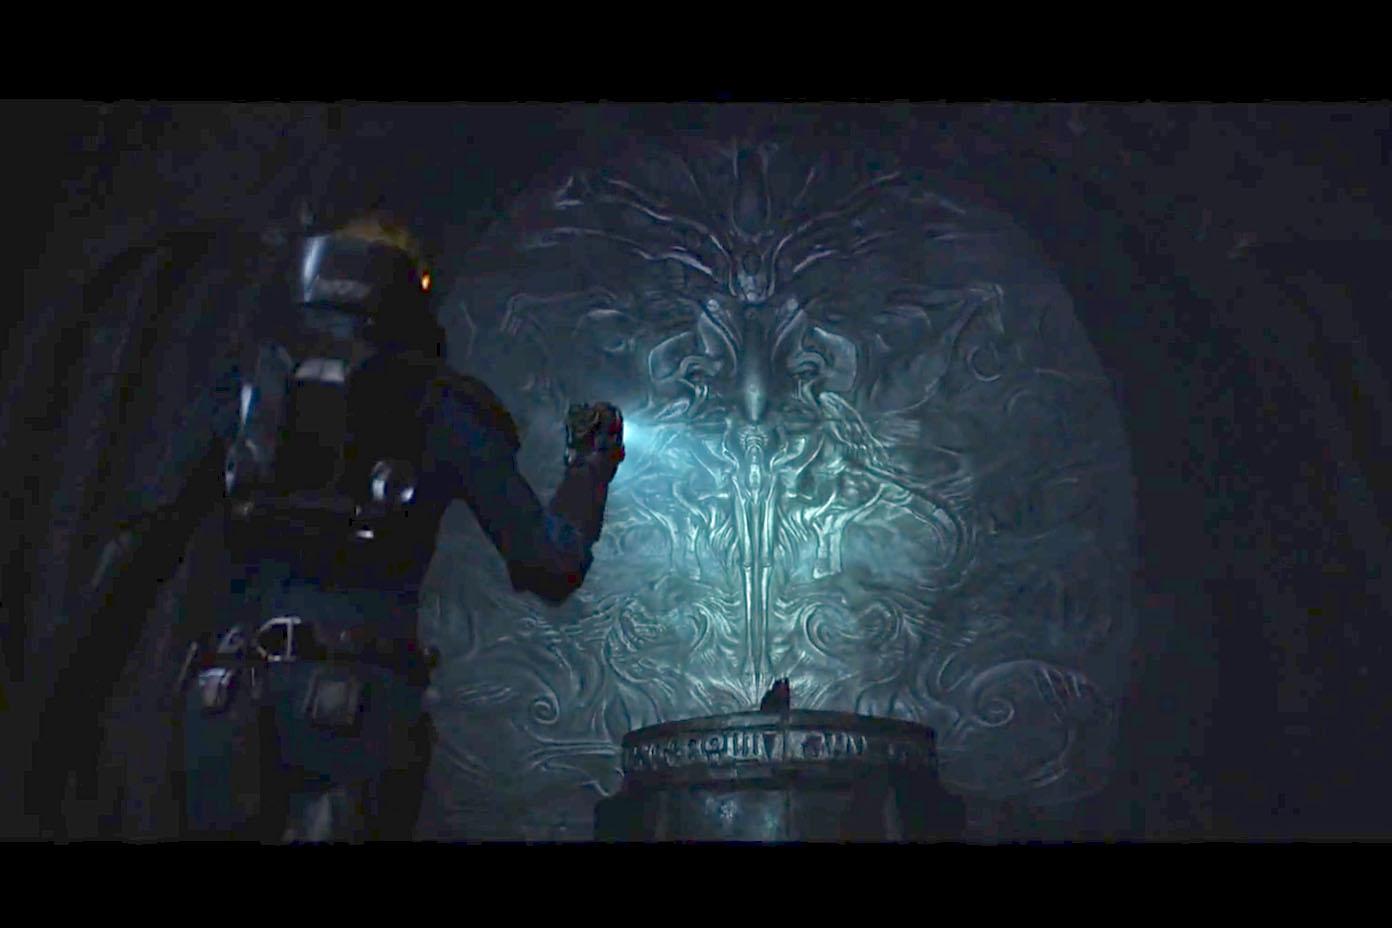 Cody 39 s film tv and video game blog for Prometheus xenomorph mural